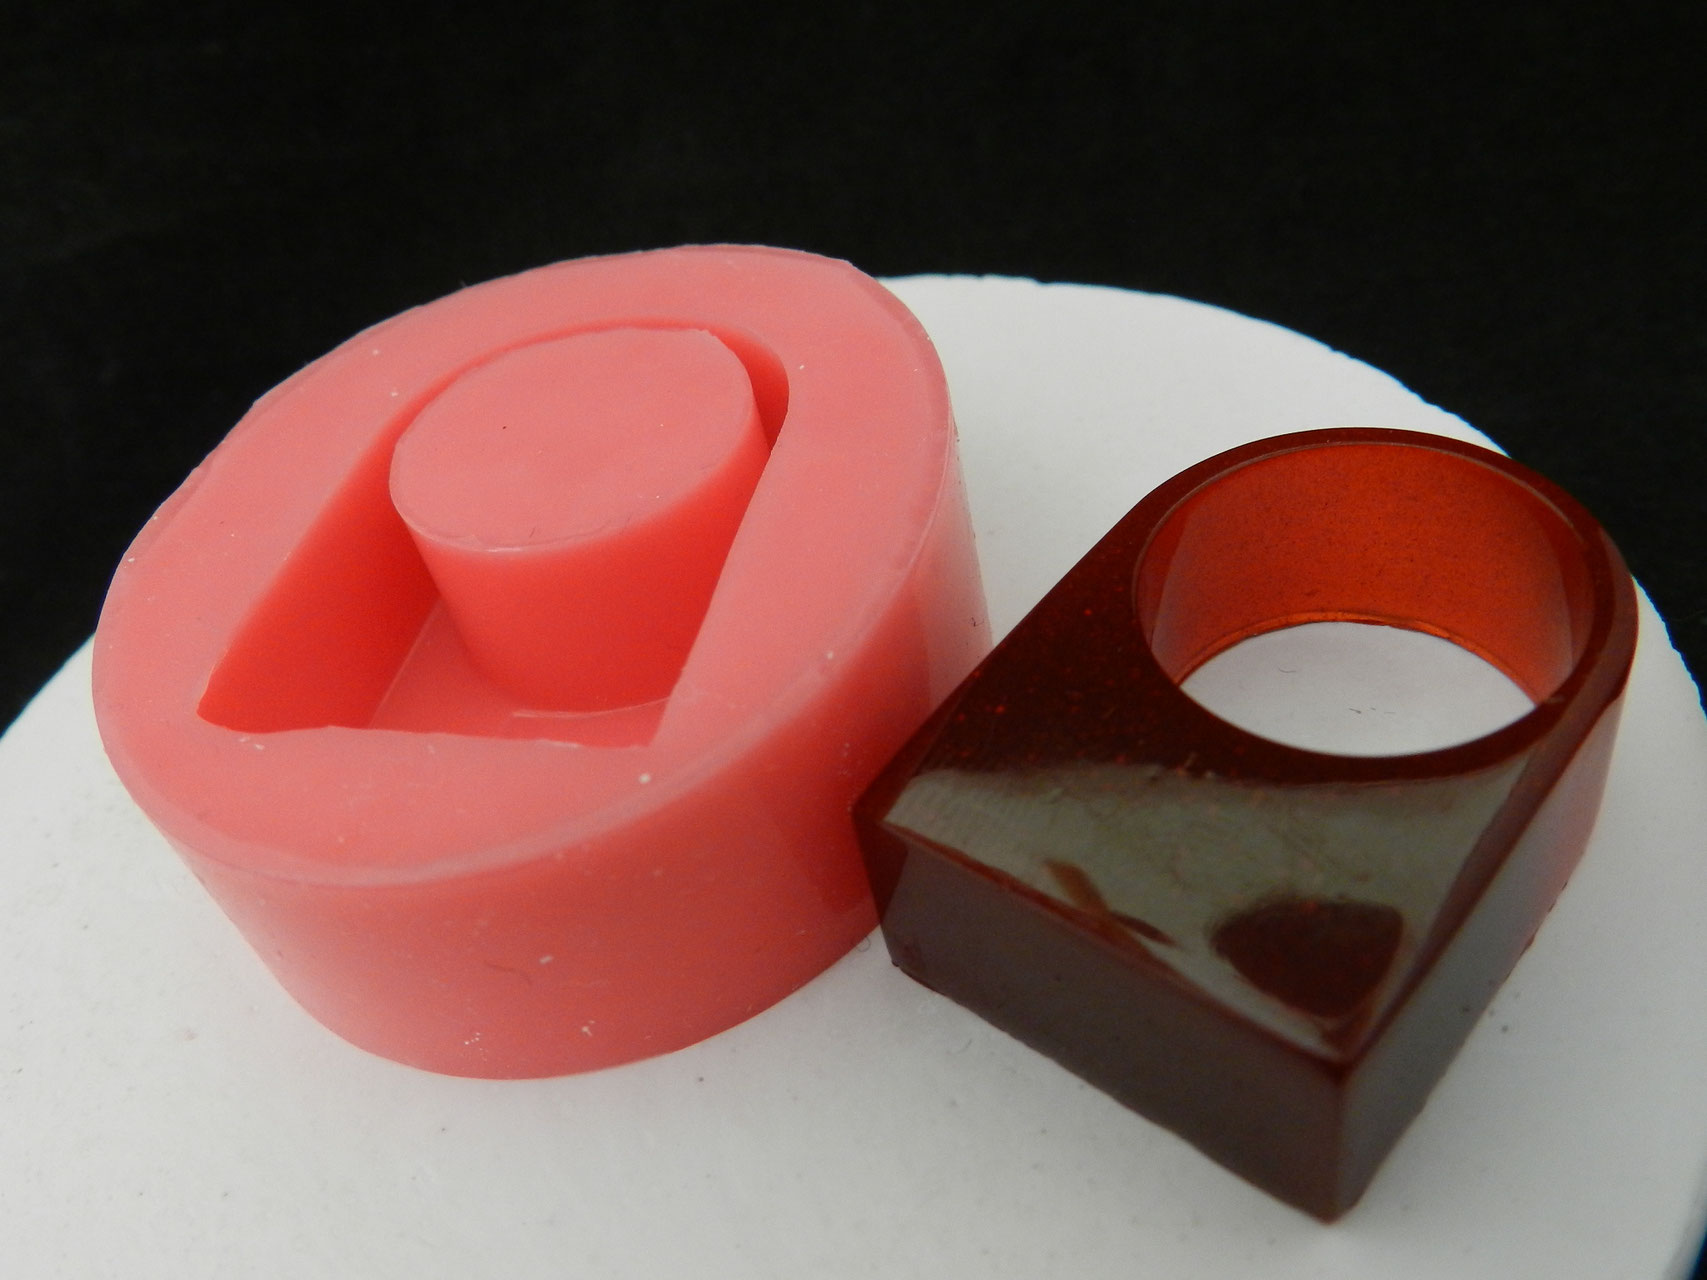 schmuckgie formen aus silikon silikon macht das schon. Black Bedroom Furniture Sets. Home Design Ideas